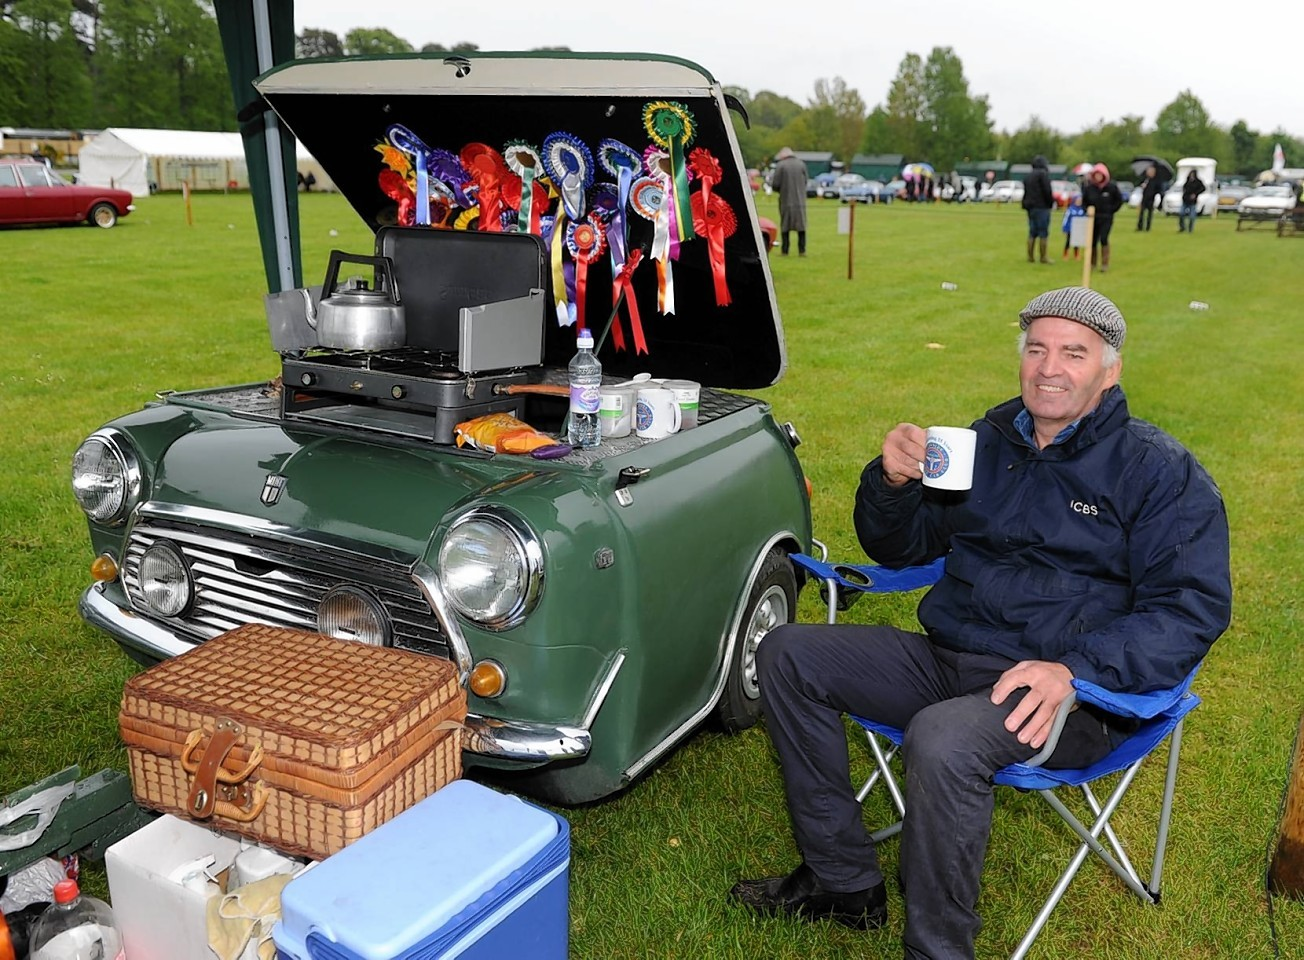 Paul Johnson with his Mini Cooper trailer.